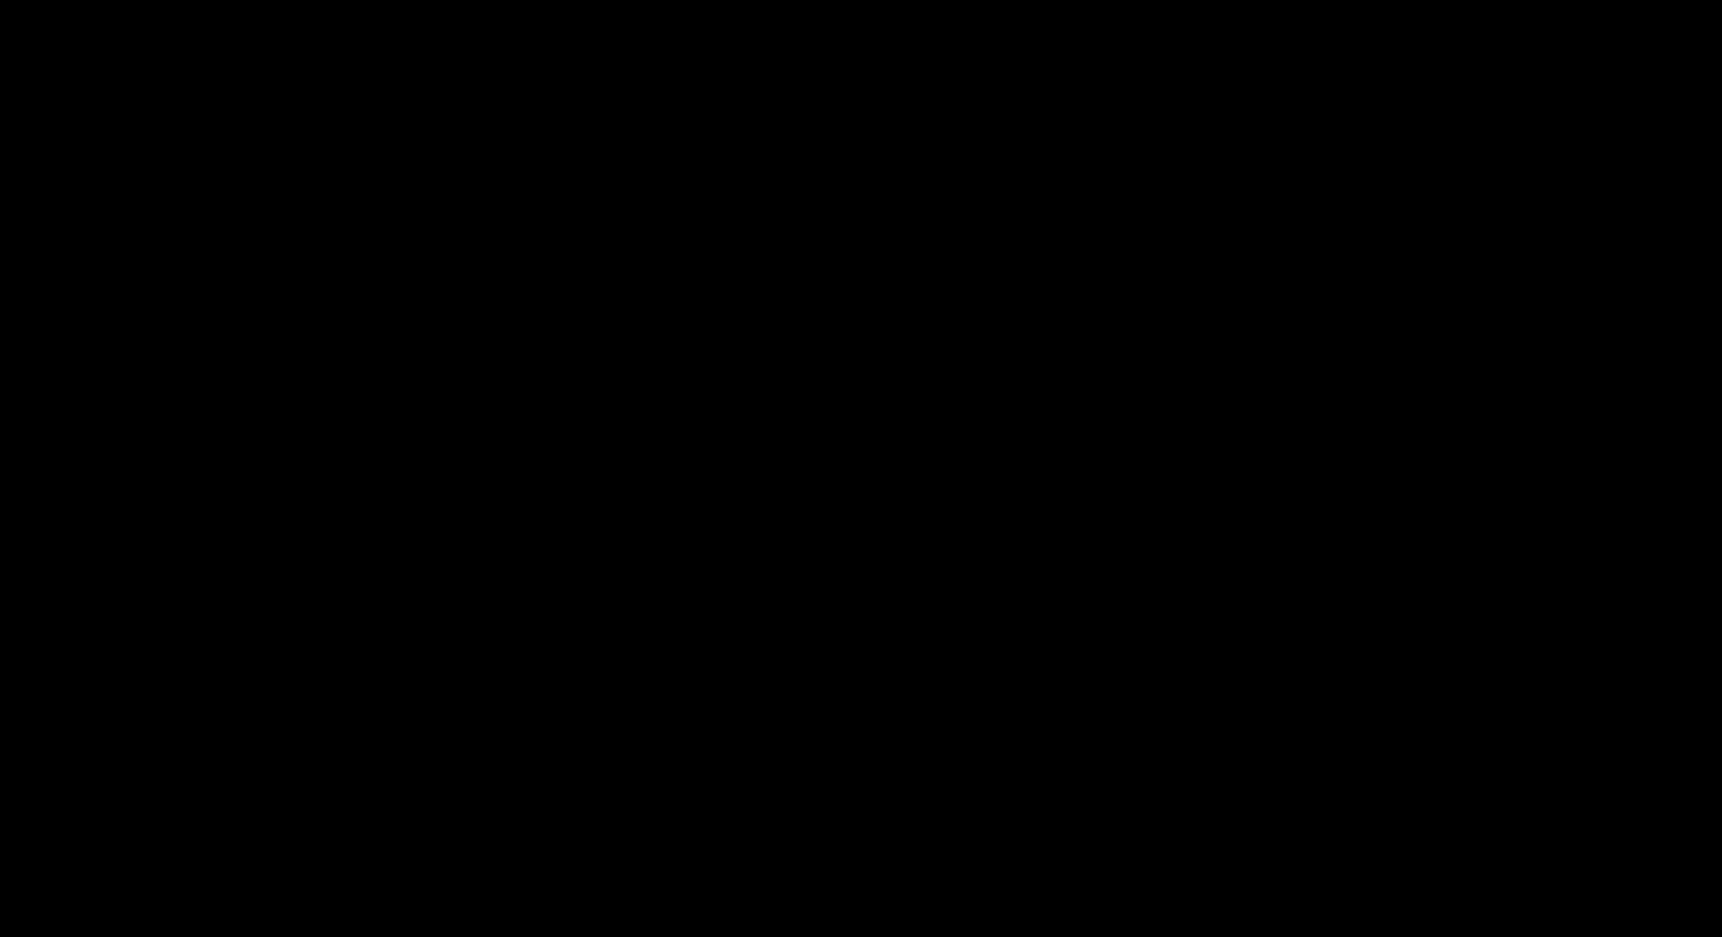 Image result for tivozanib